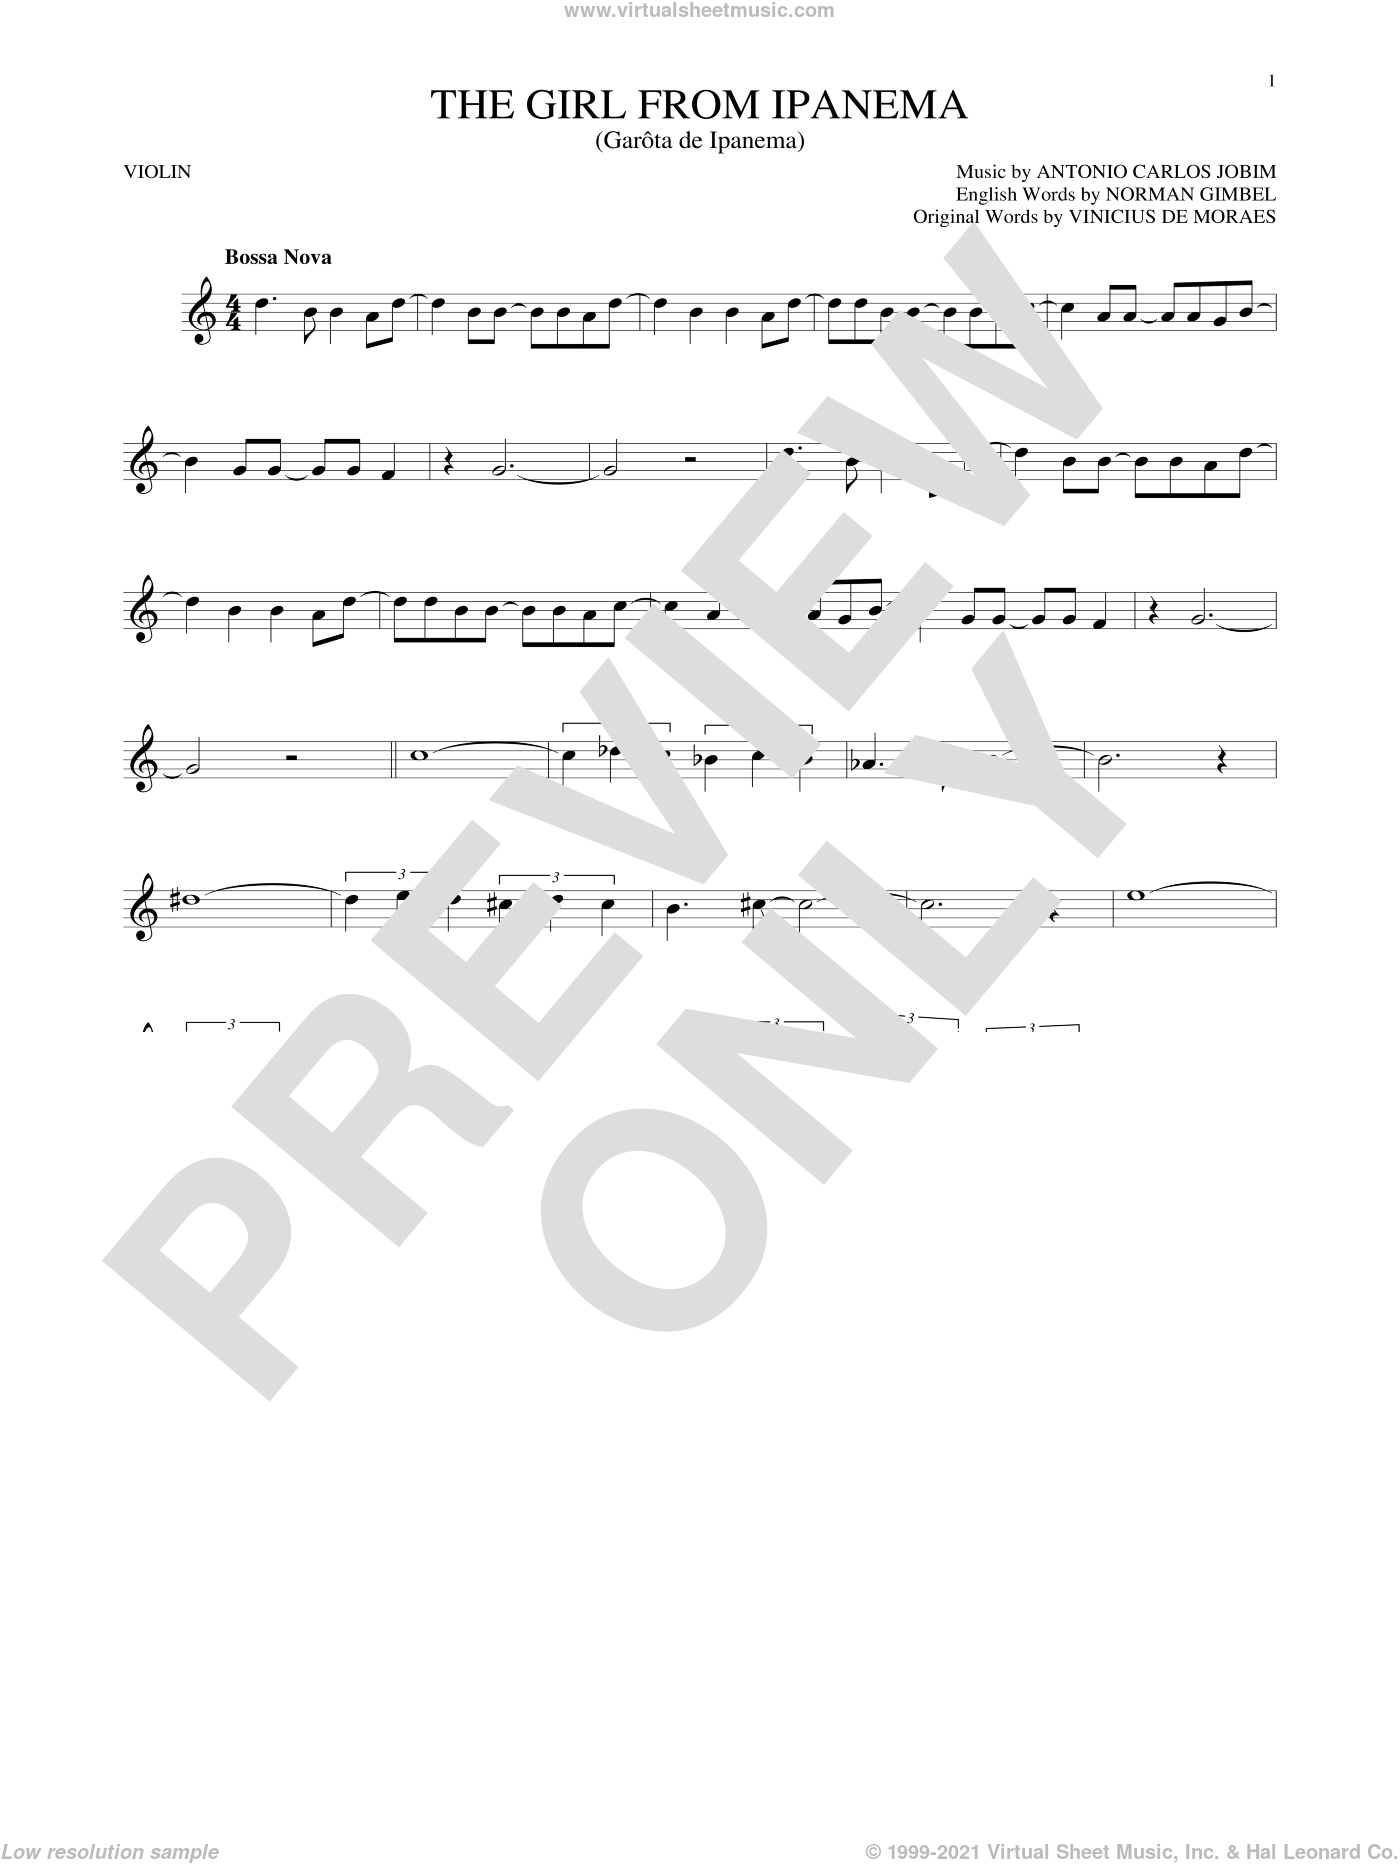 The Girl From Ipanema (Garota De Ipanema) sheet music for violin solo by Norman Gimbel, Stan Getz & Astrud Gilberto, Antonio Carlos Jobim and Vinicius de Moraes, intermediate skill level